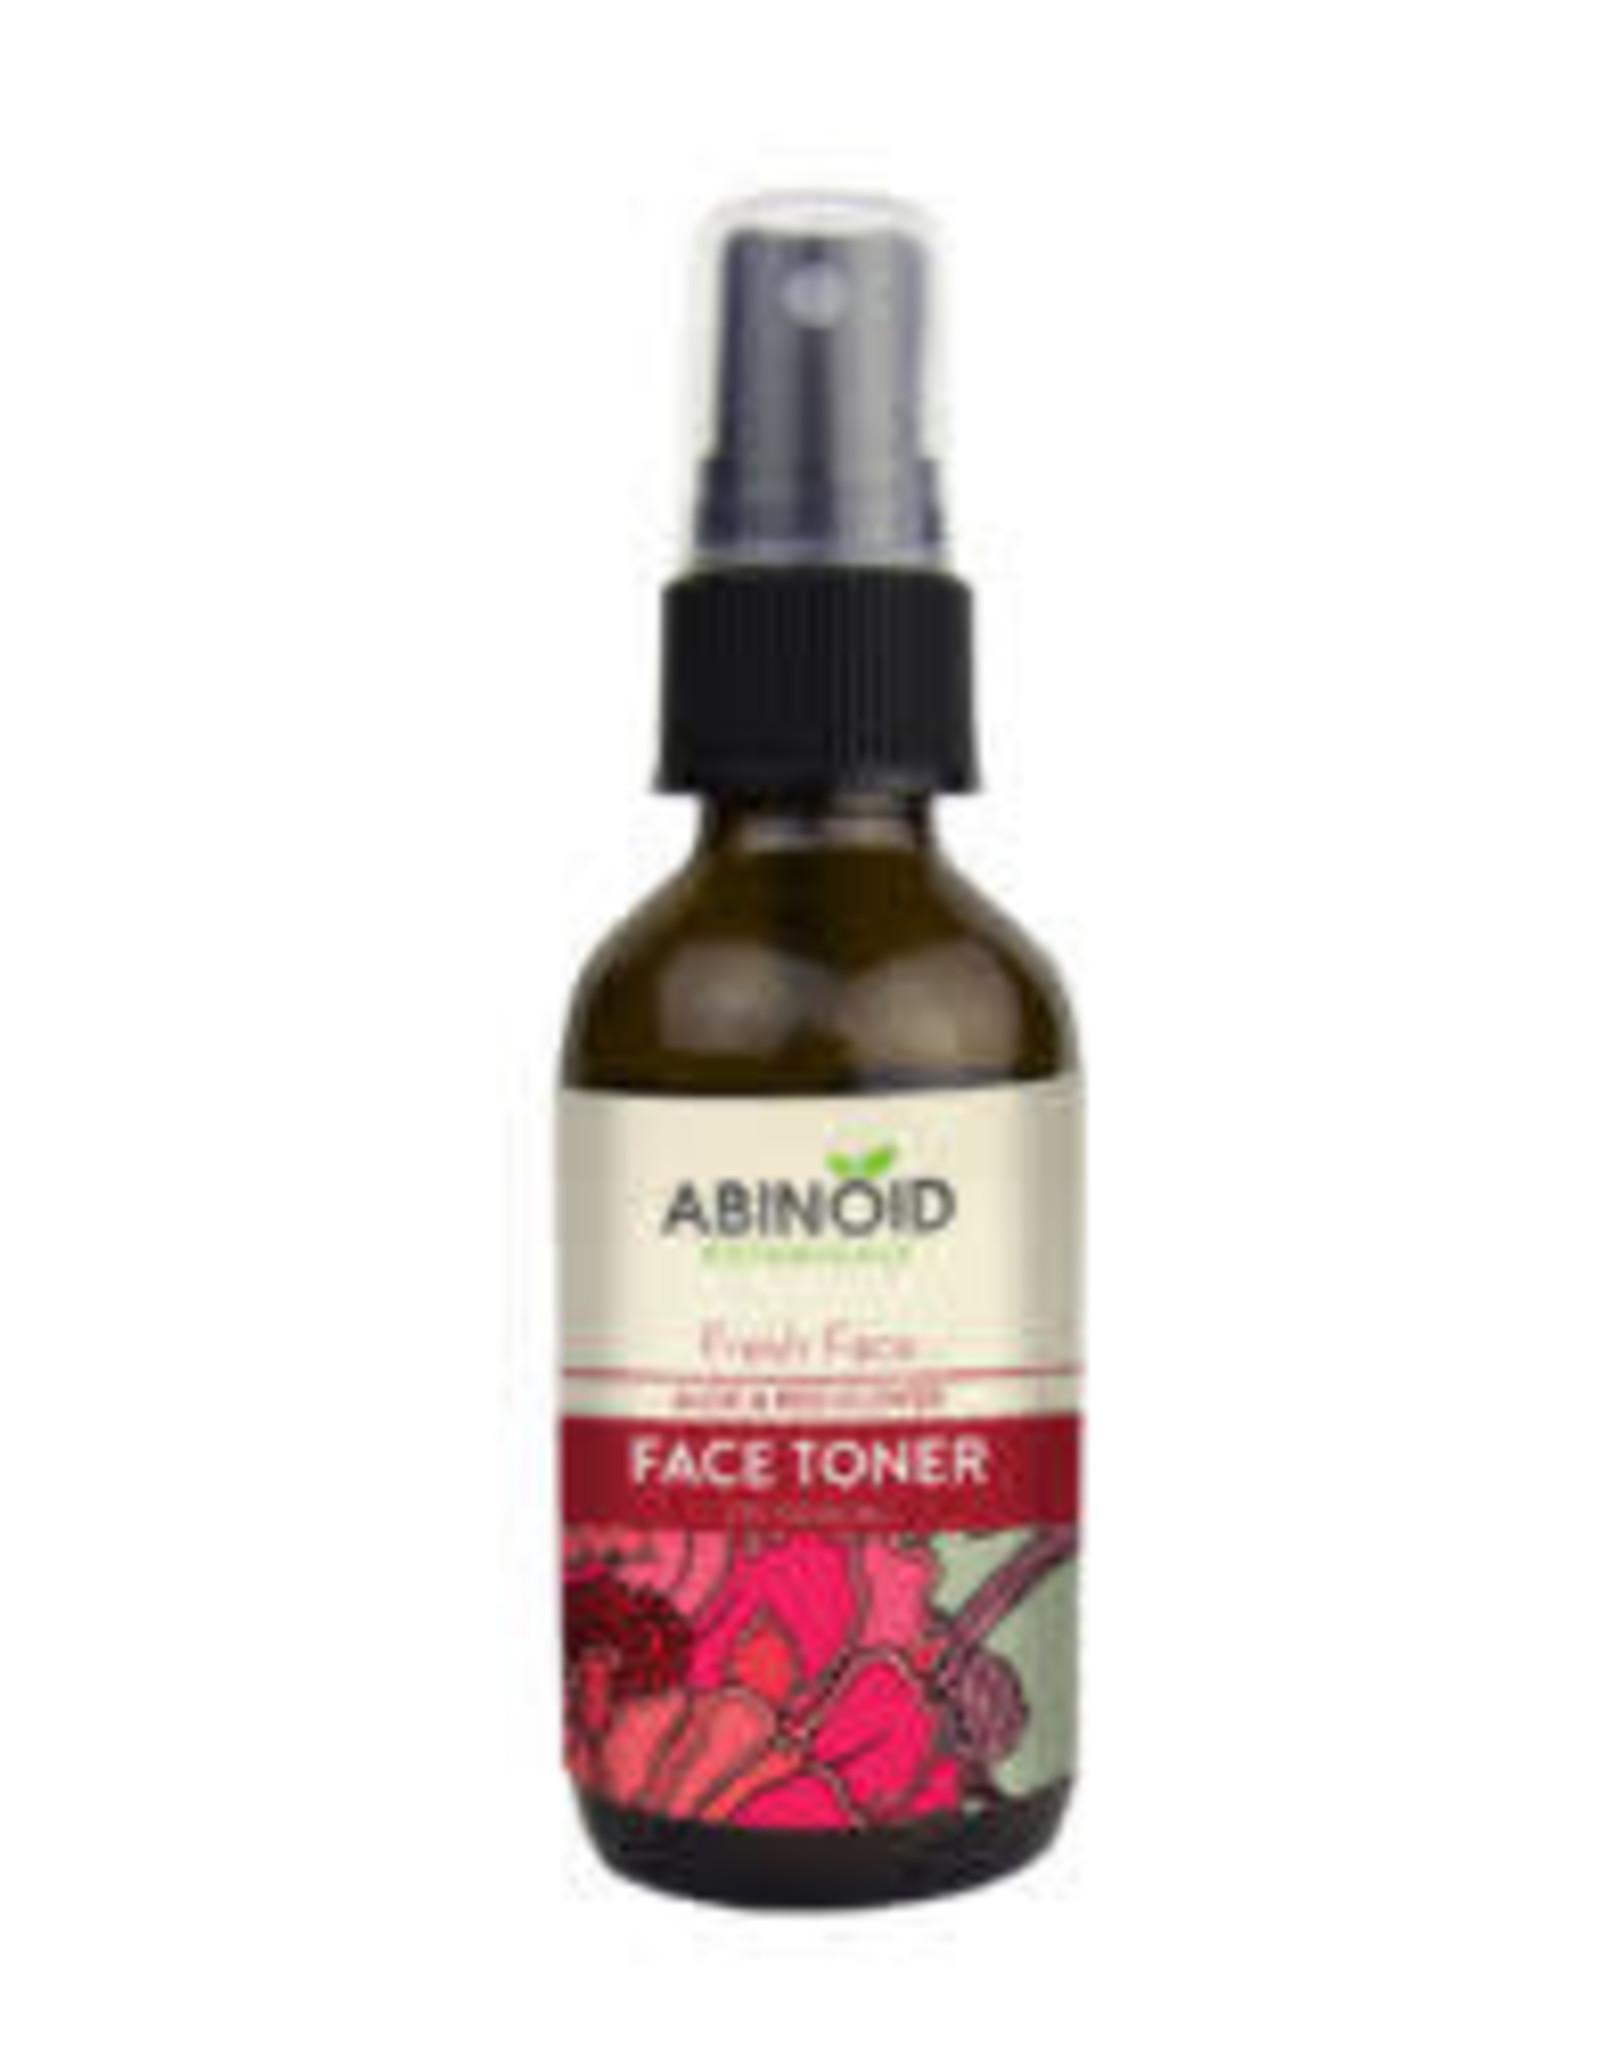 Abinoid Face Toner